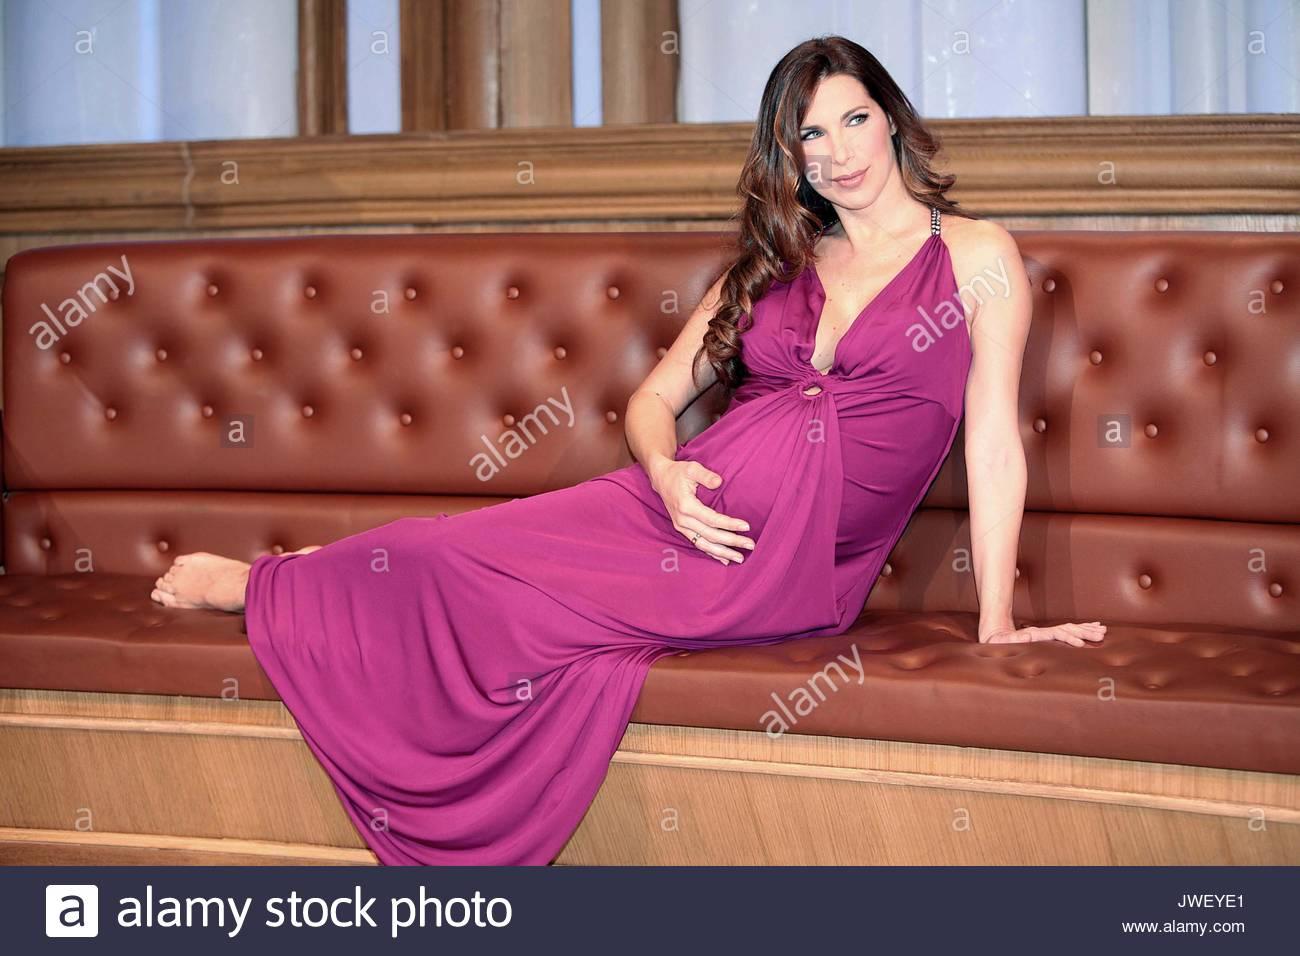 Celebrites Veronica Maya nudes (35 photos), Sexy, Hot, Boobs, cleavage 2019